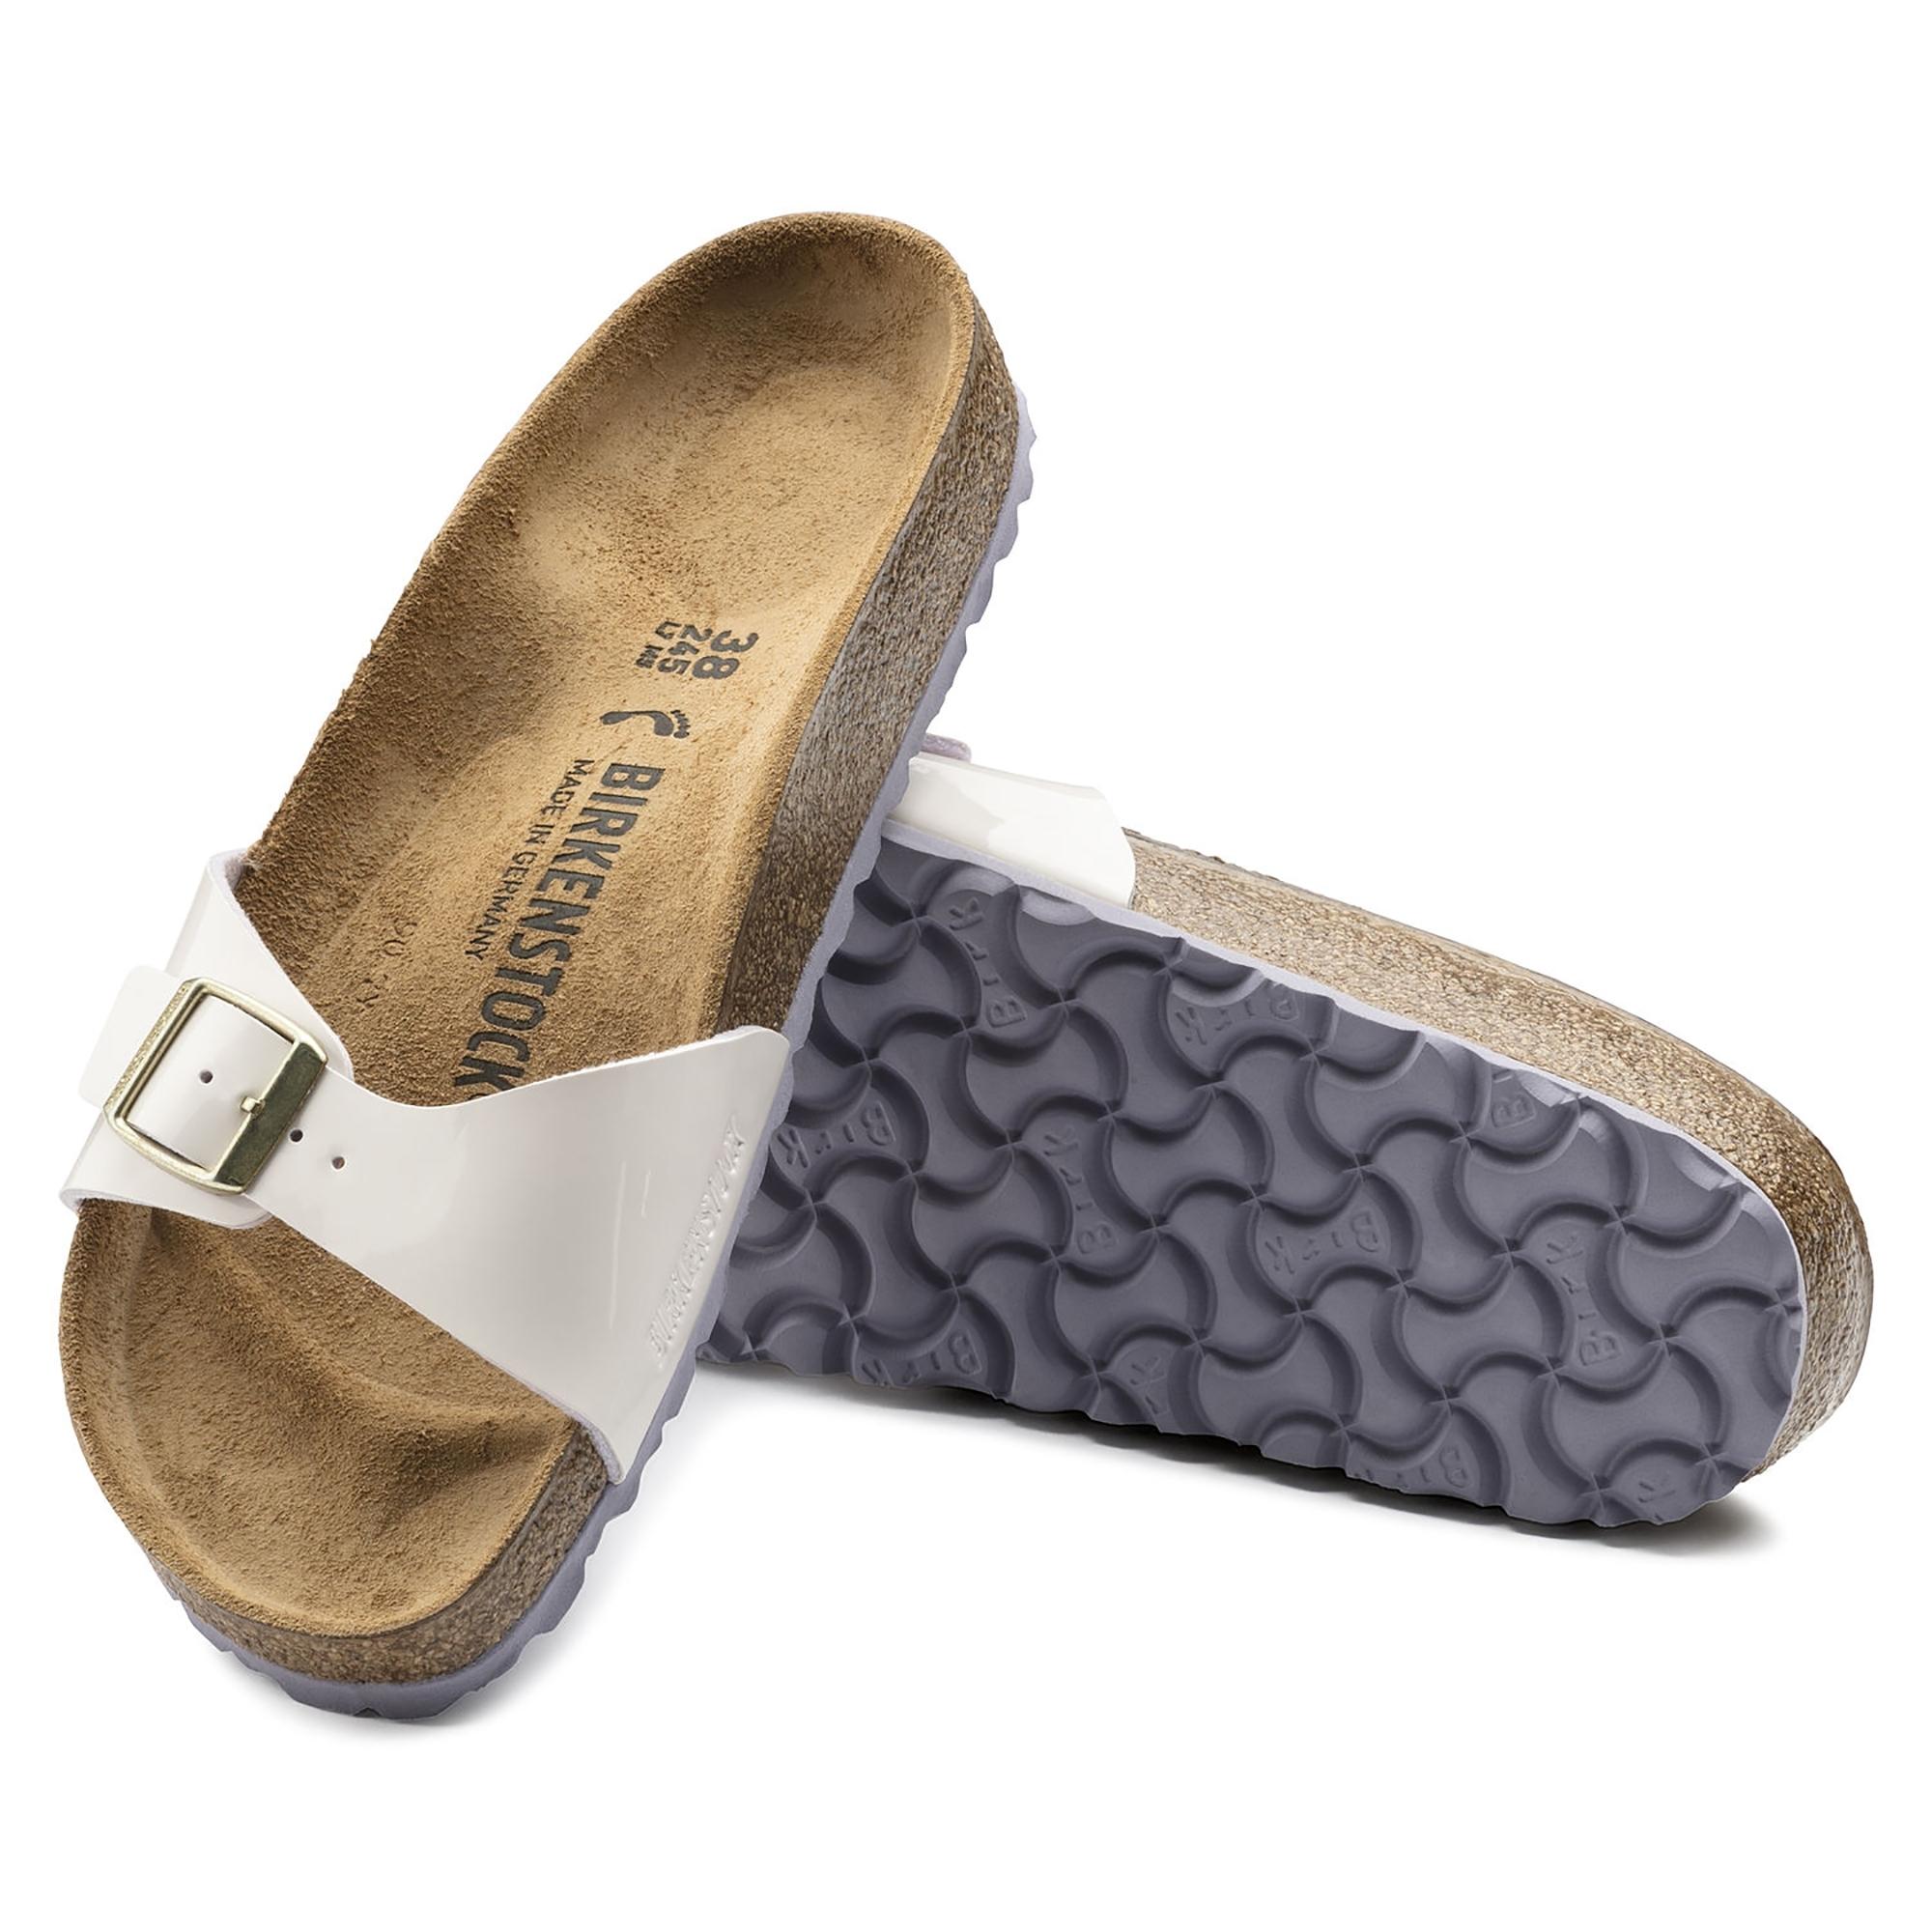 Birkenstock Madrid 1008457 Ladies One Strap Sandals Cream Pink Shuperb Sandal Strape On